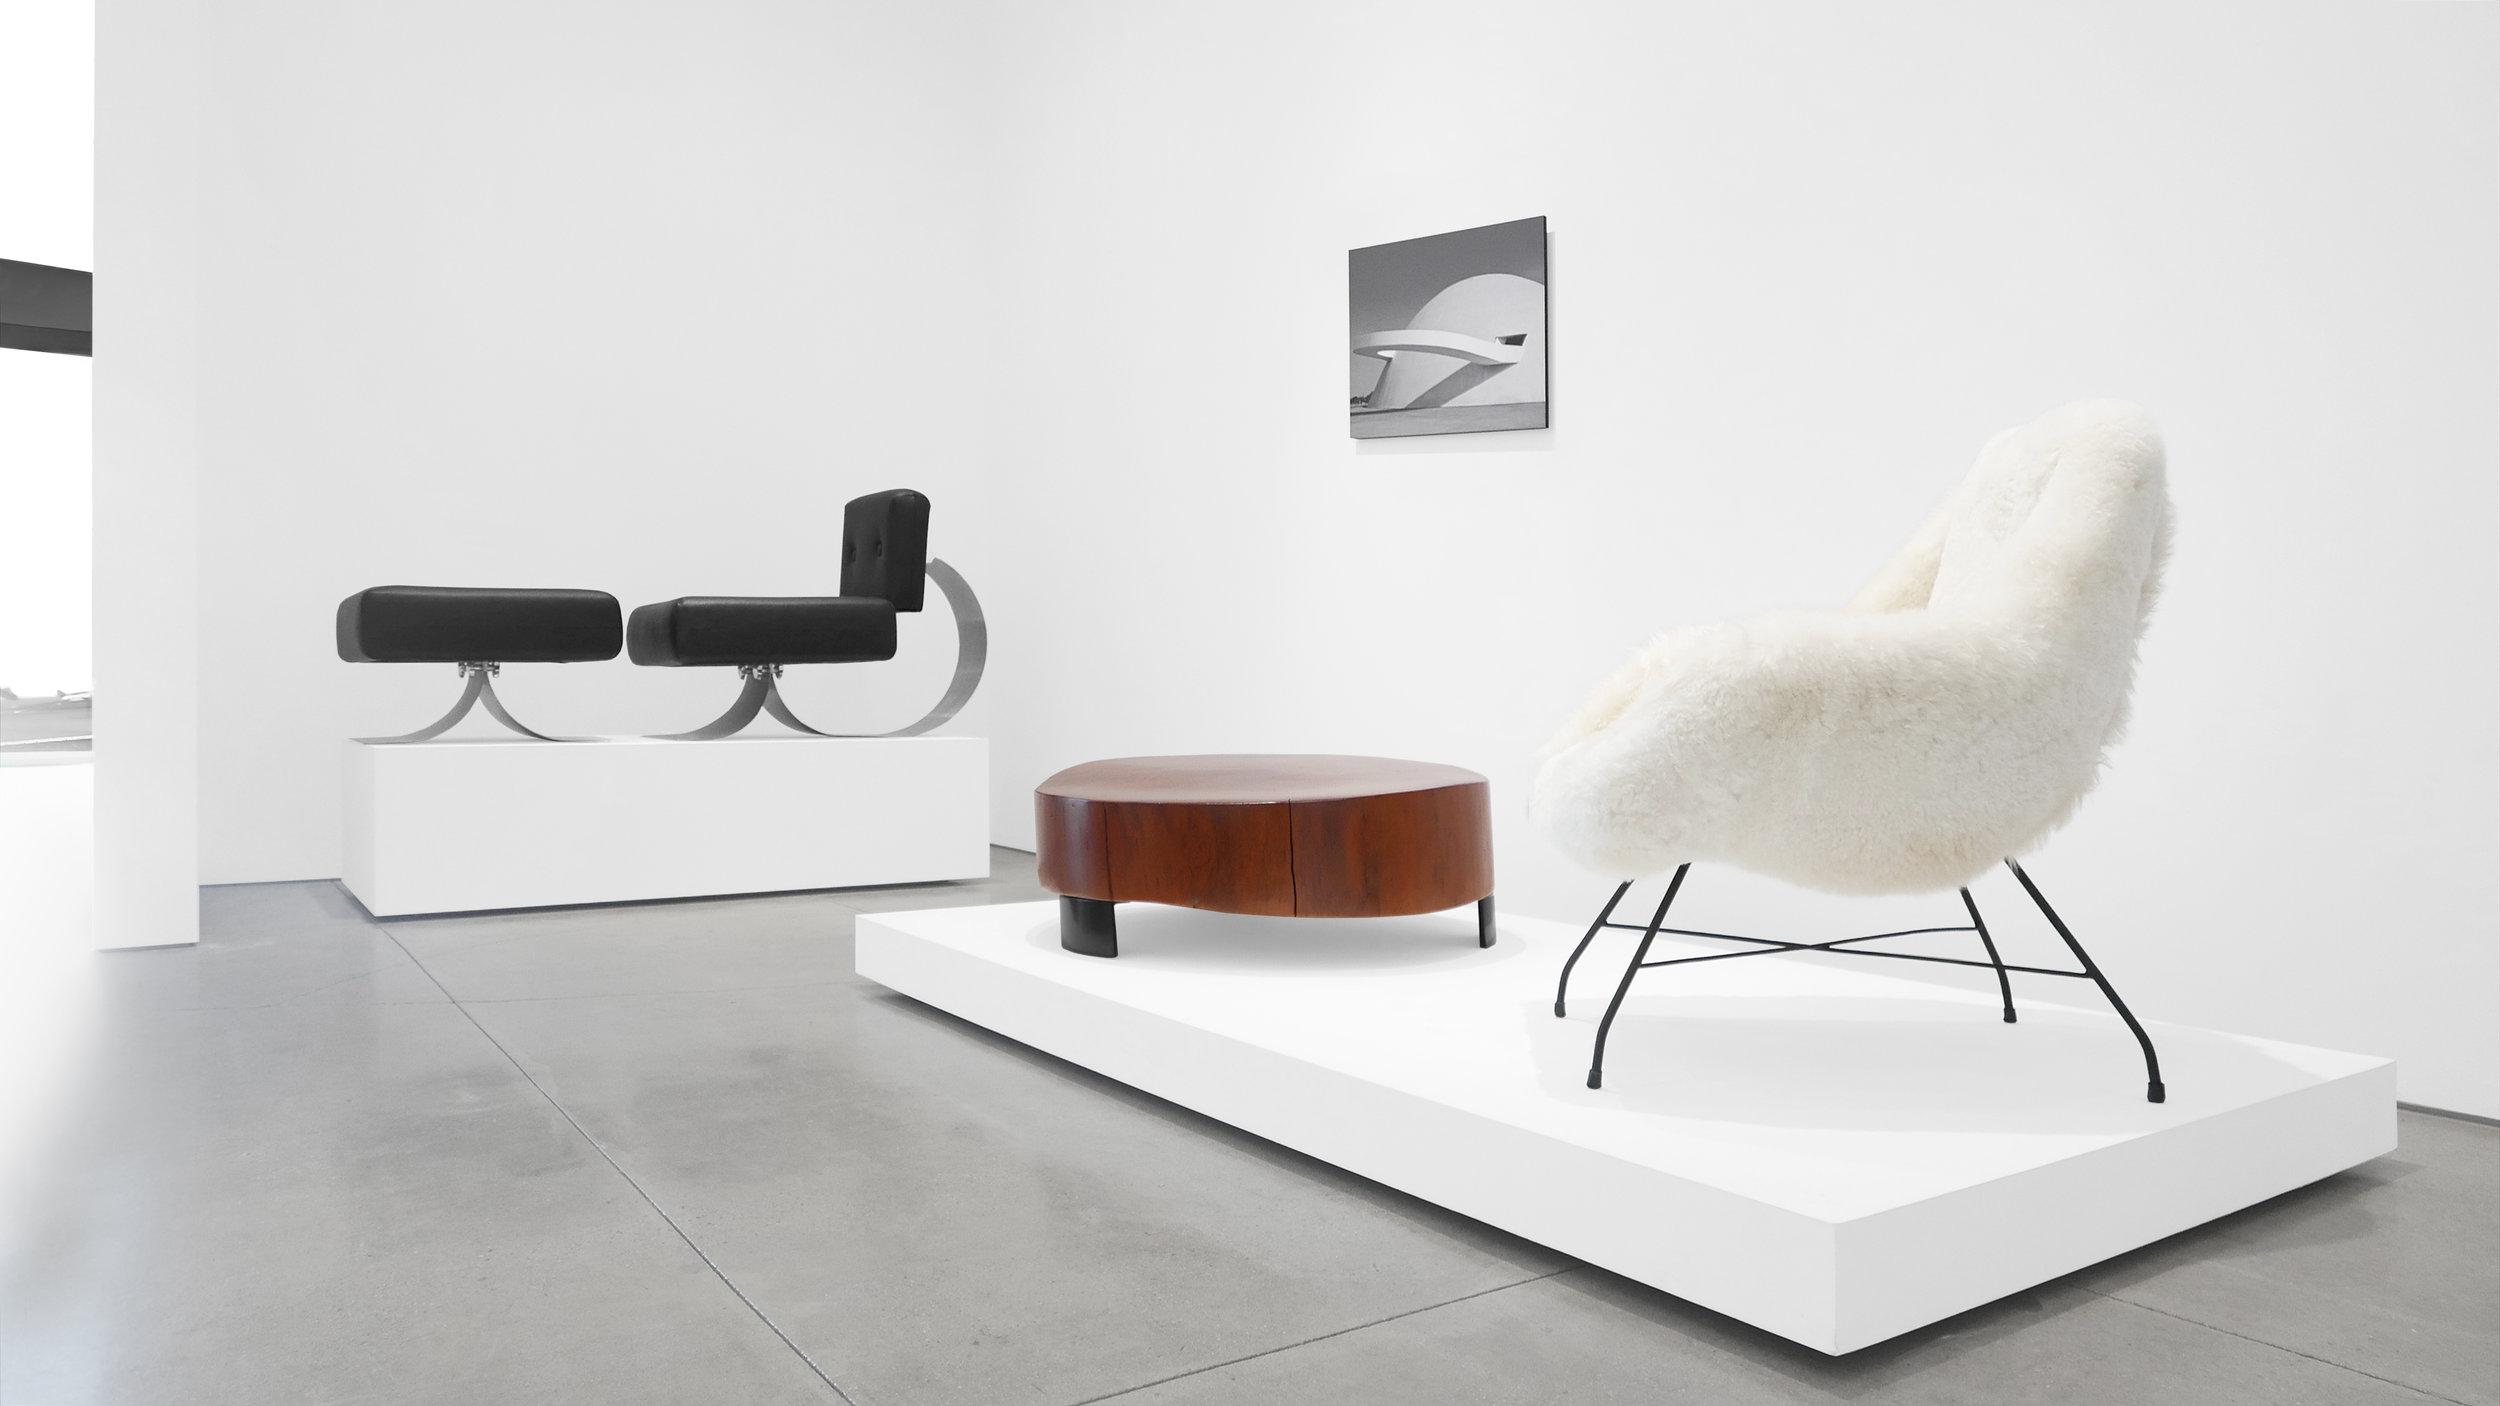 Design Brasileiro, Curated by Ulysses de Santi, Peter Blake Gallery, 2018, Installation View_6.jpg